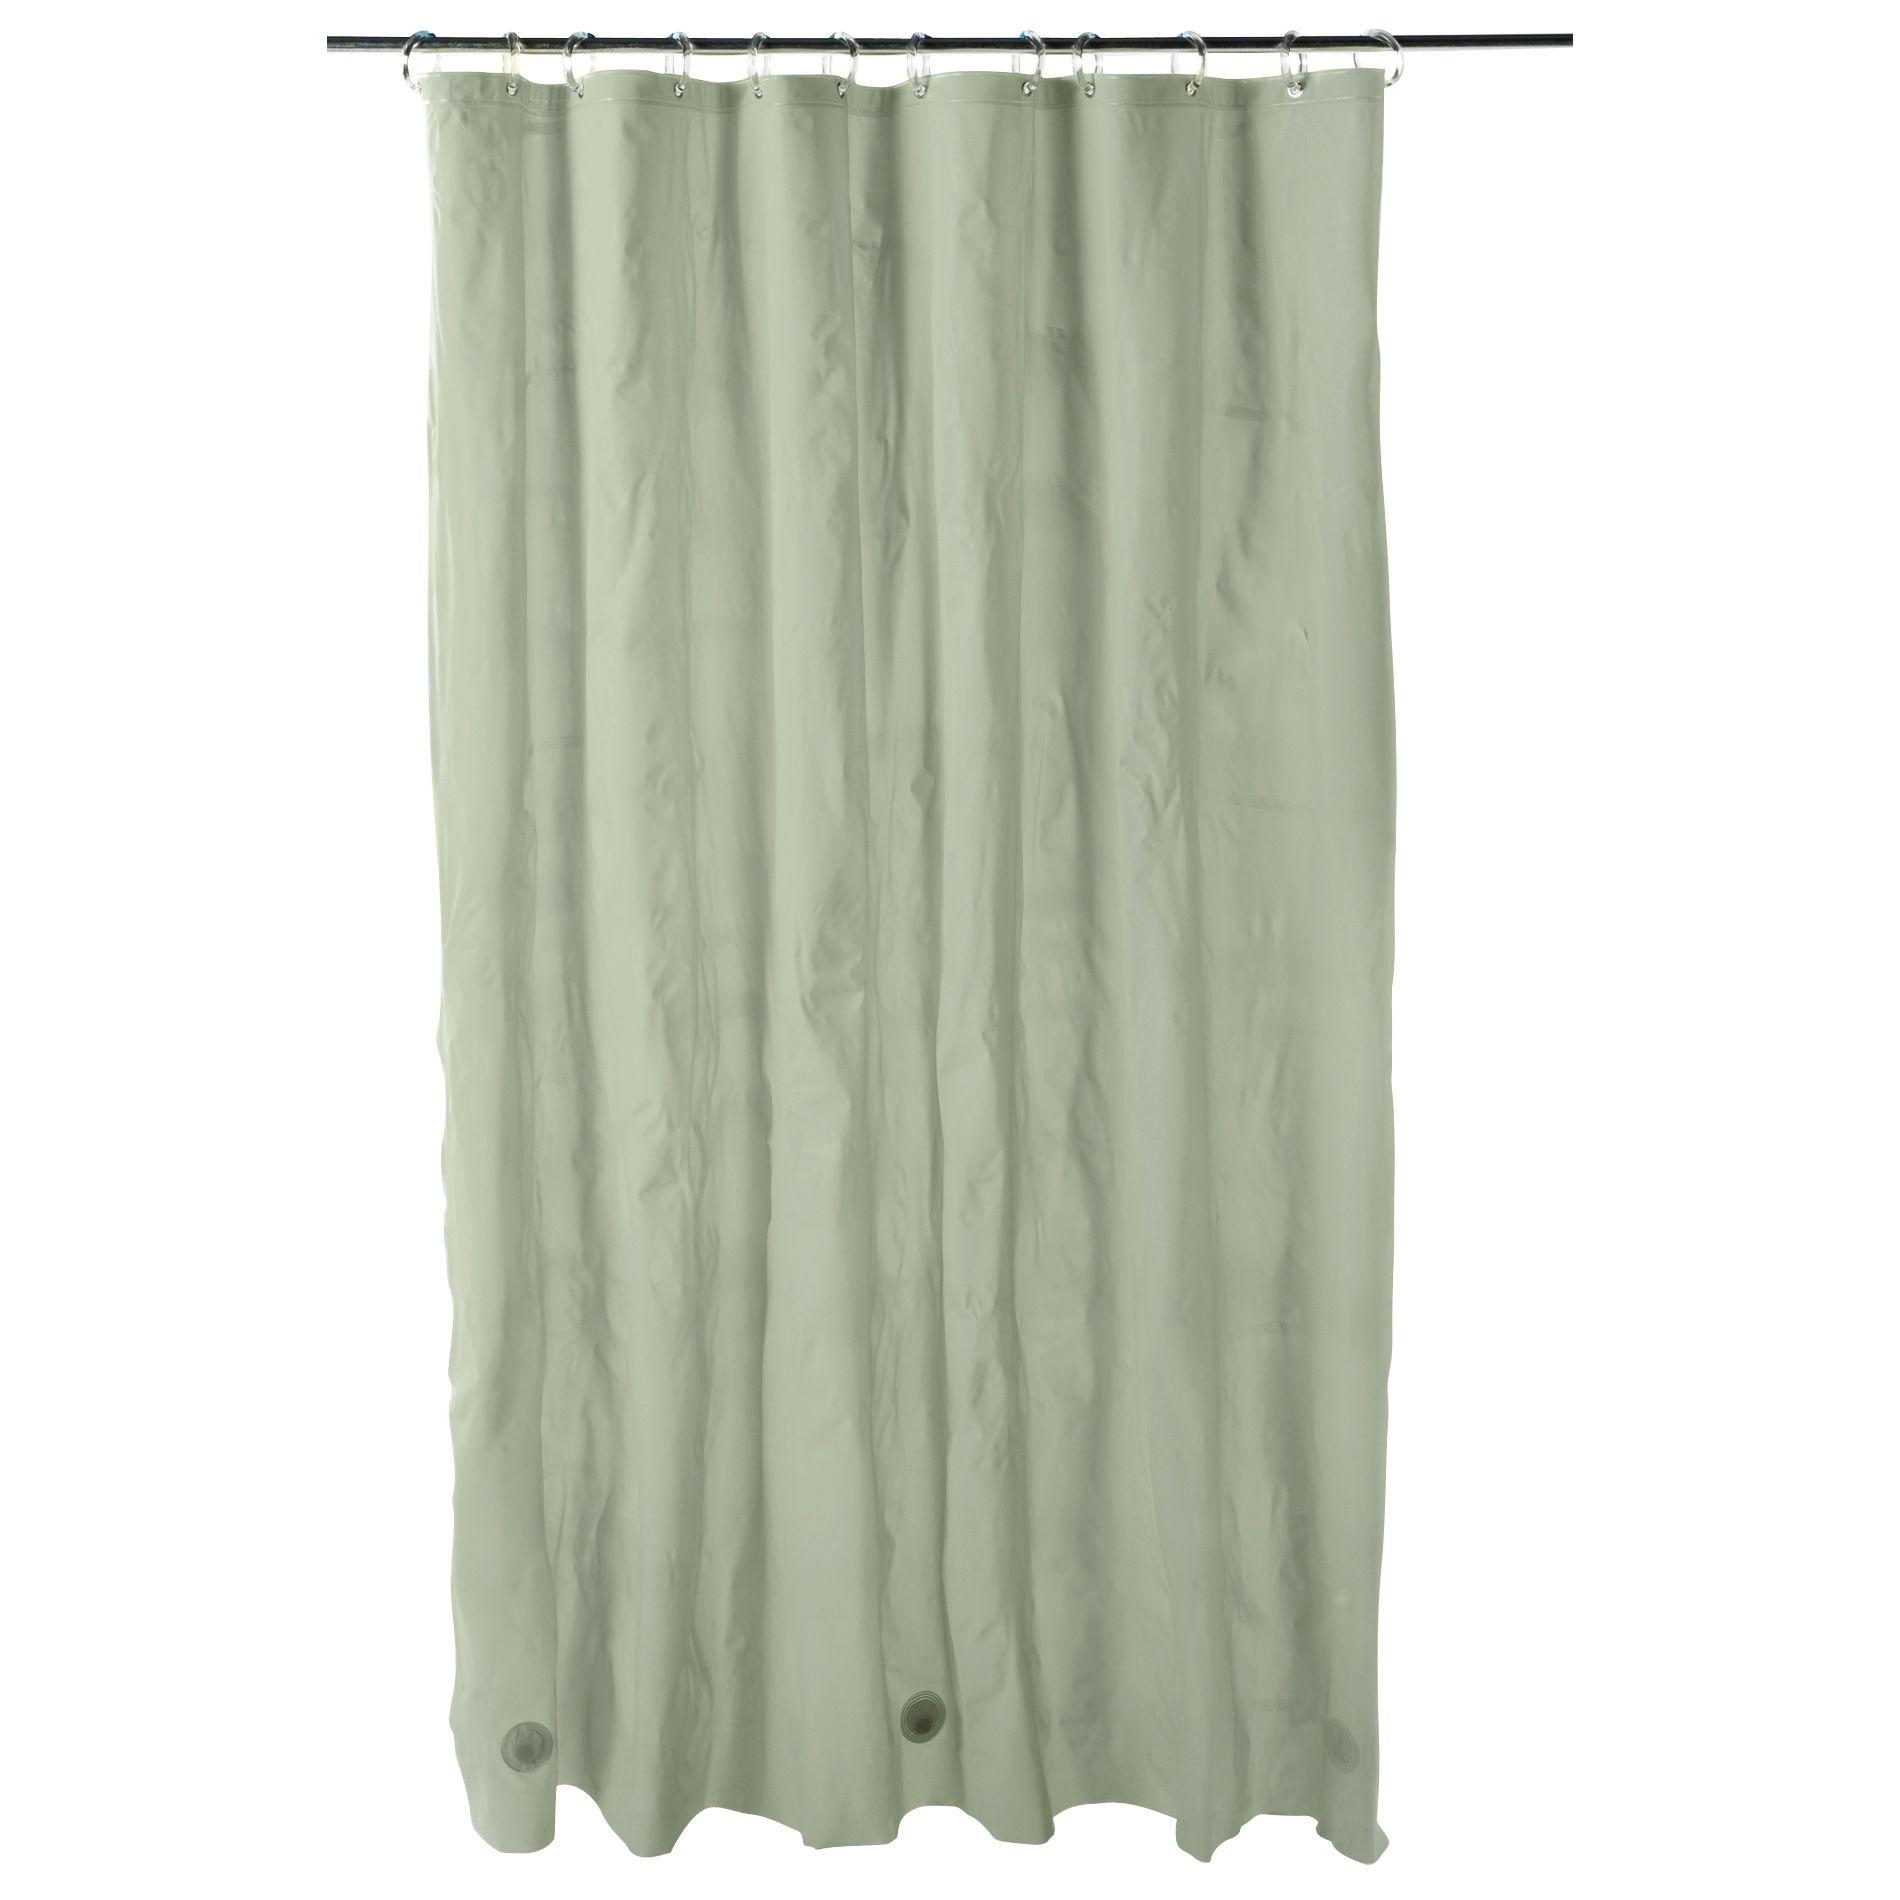 Essential Home Shower Curtain Liner 5 Gauge Vinyl PEVA, Beige